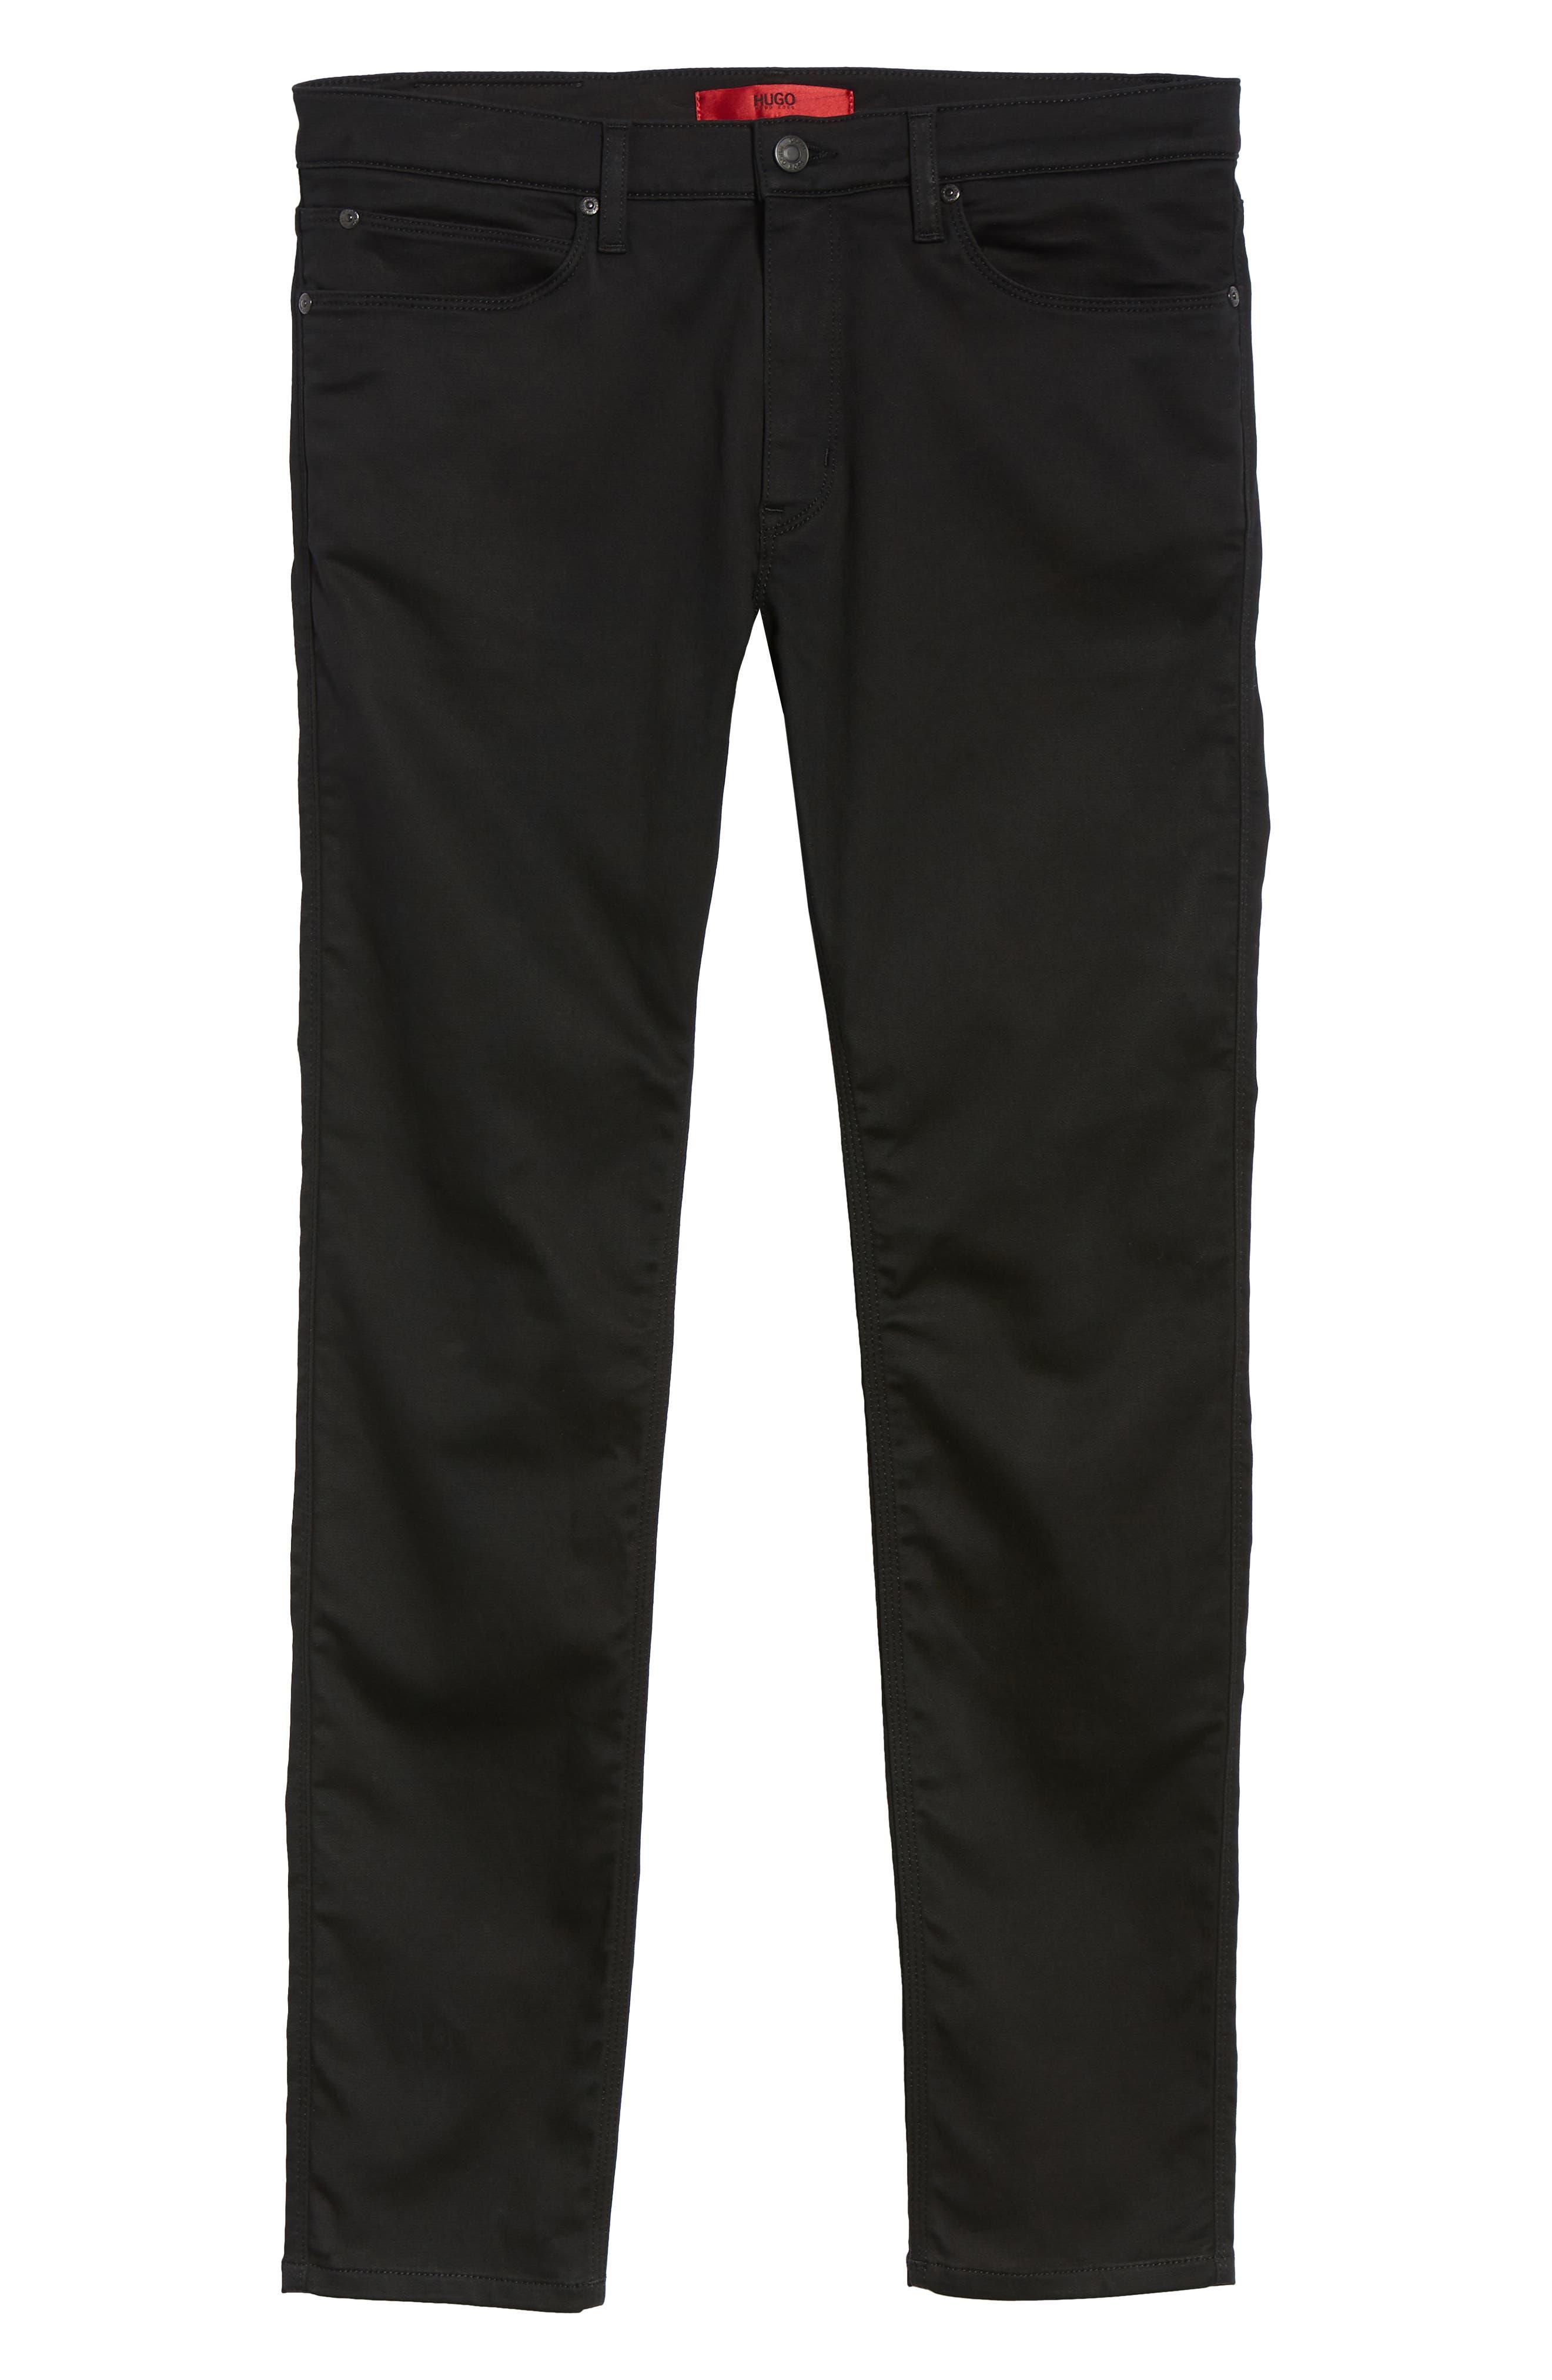 734 Skinny Fit Jeans,                             Alternate thumbnail 6, color,                             BLACK